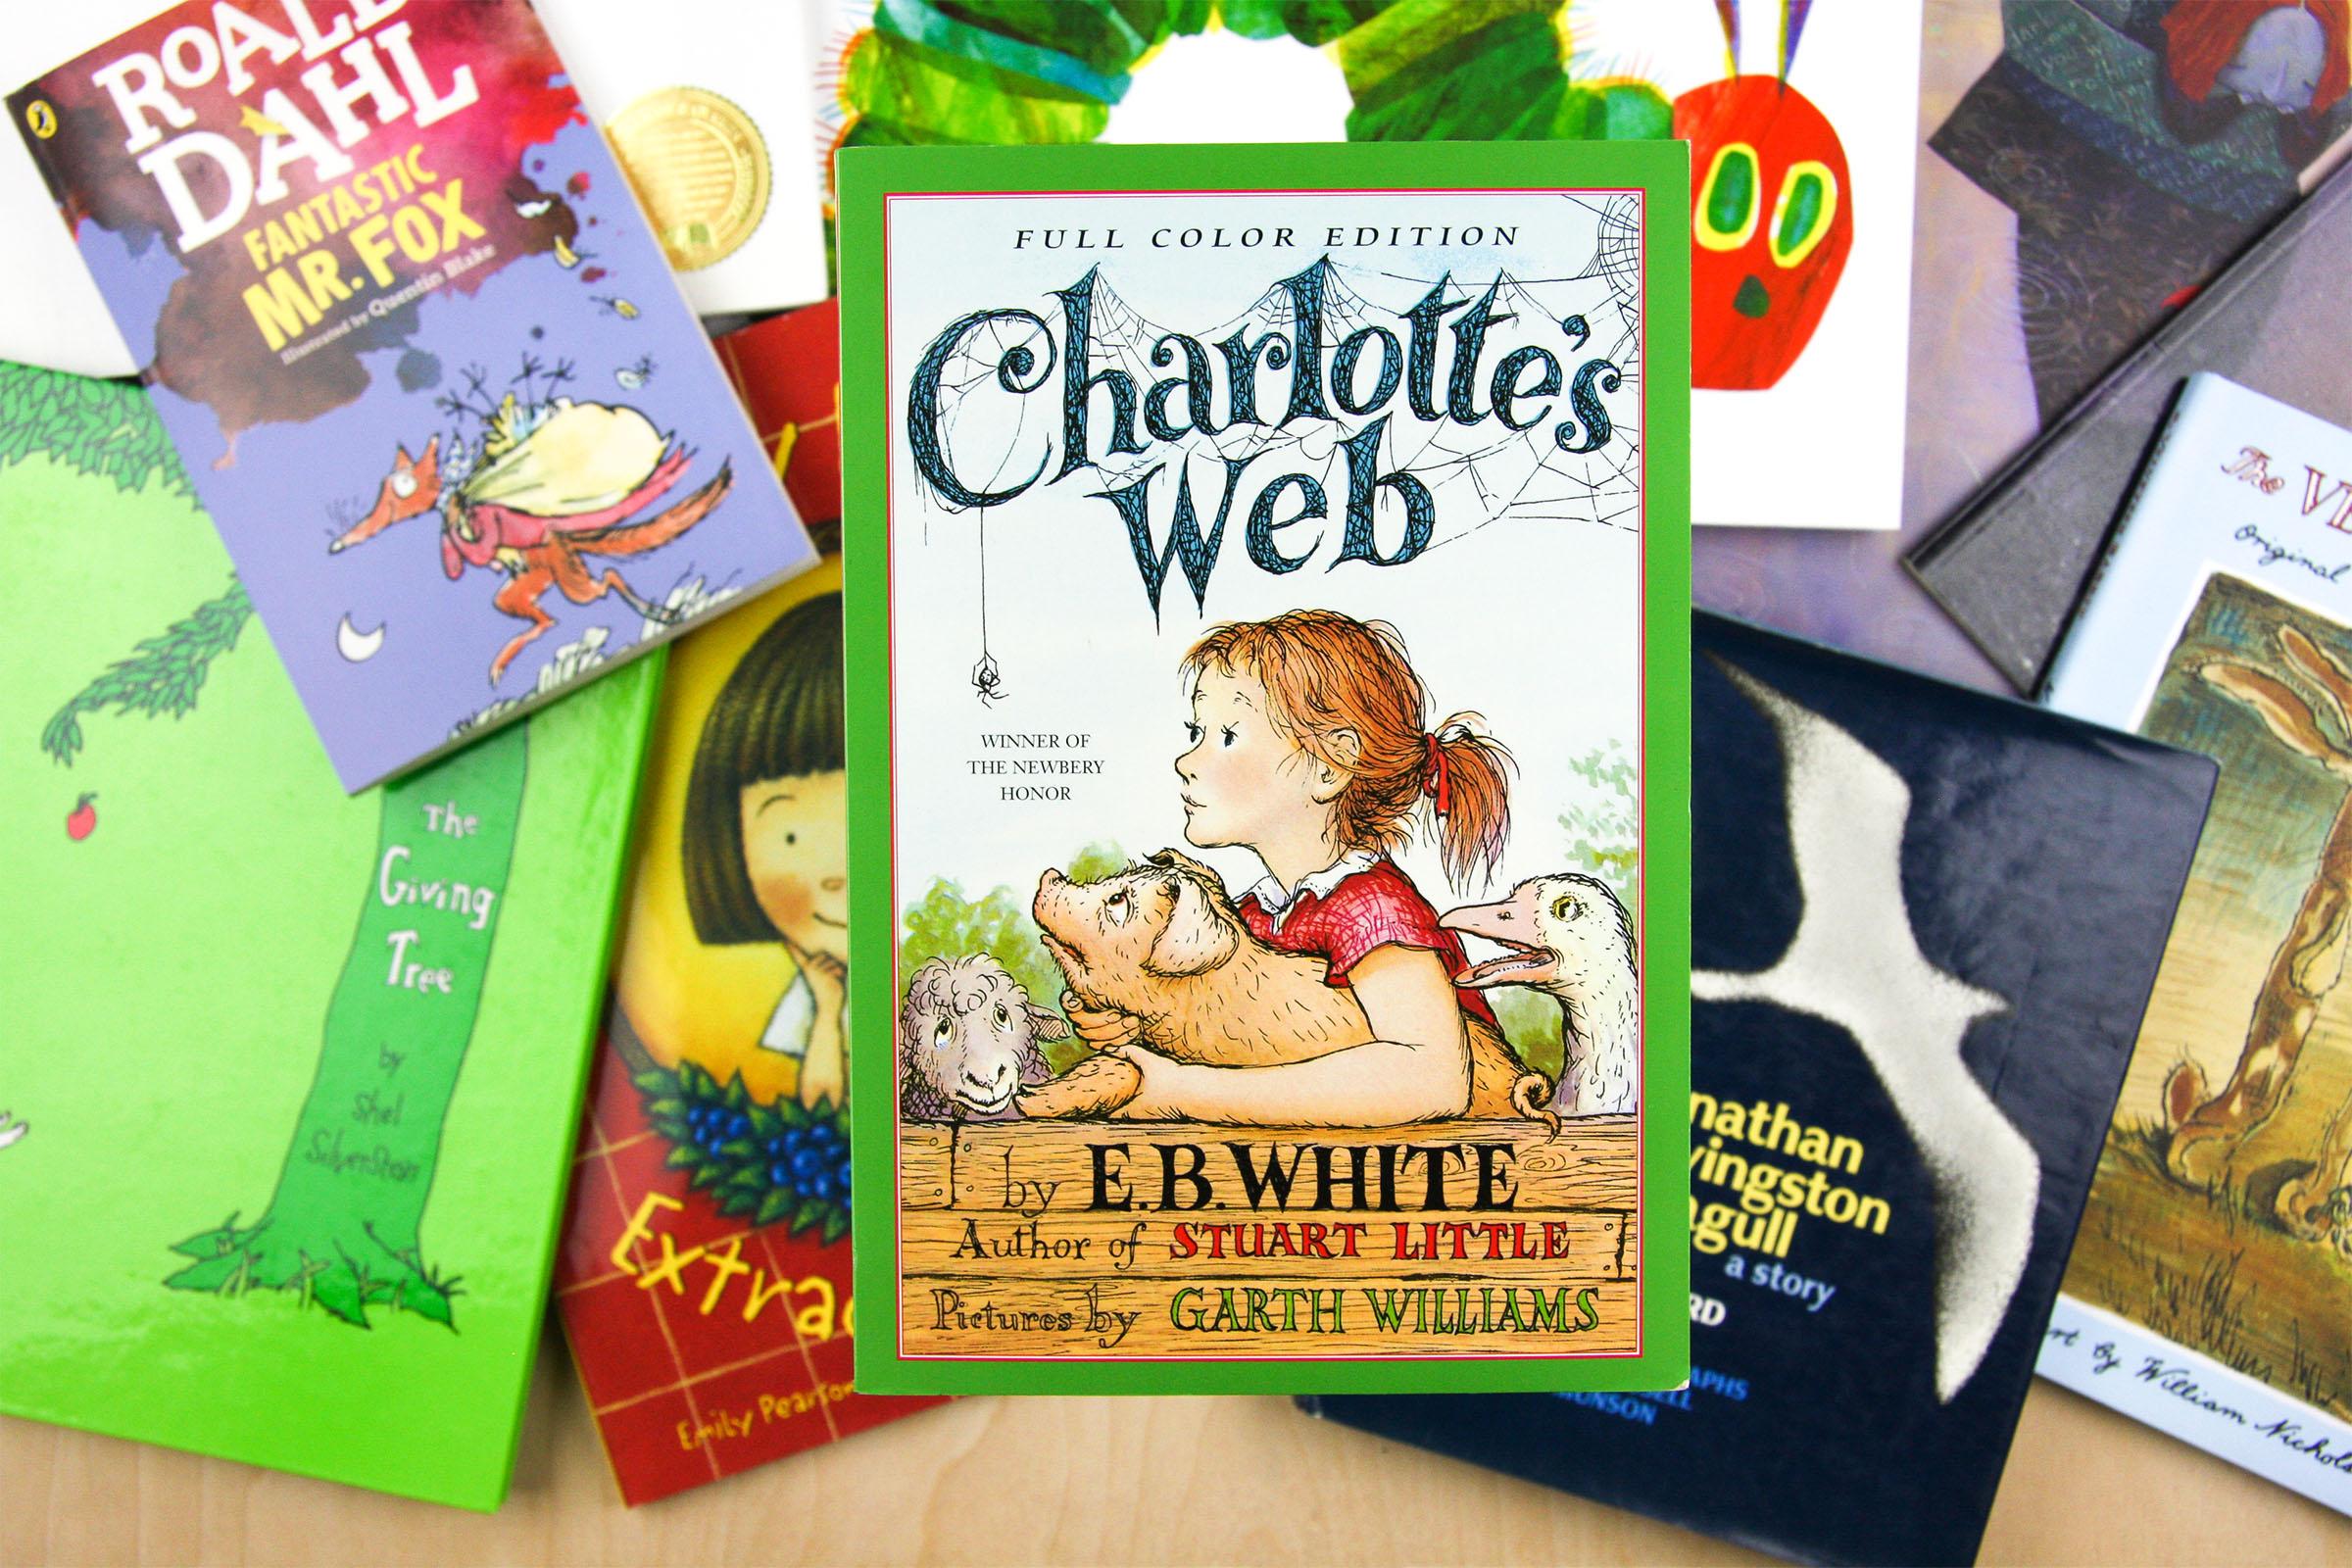 Charlottes Web by E.B.White